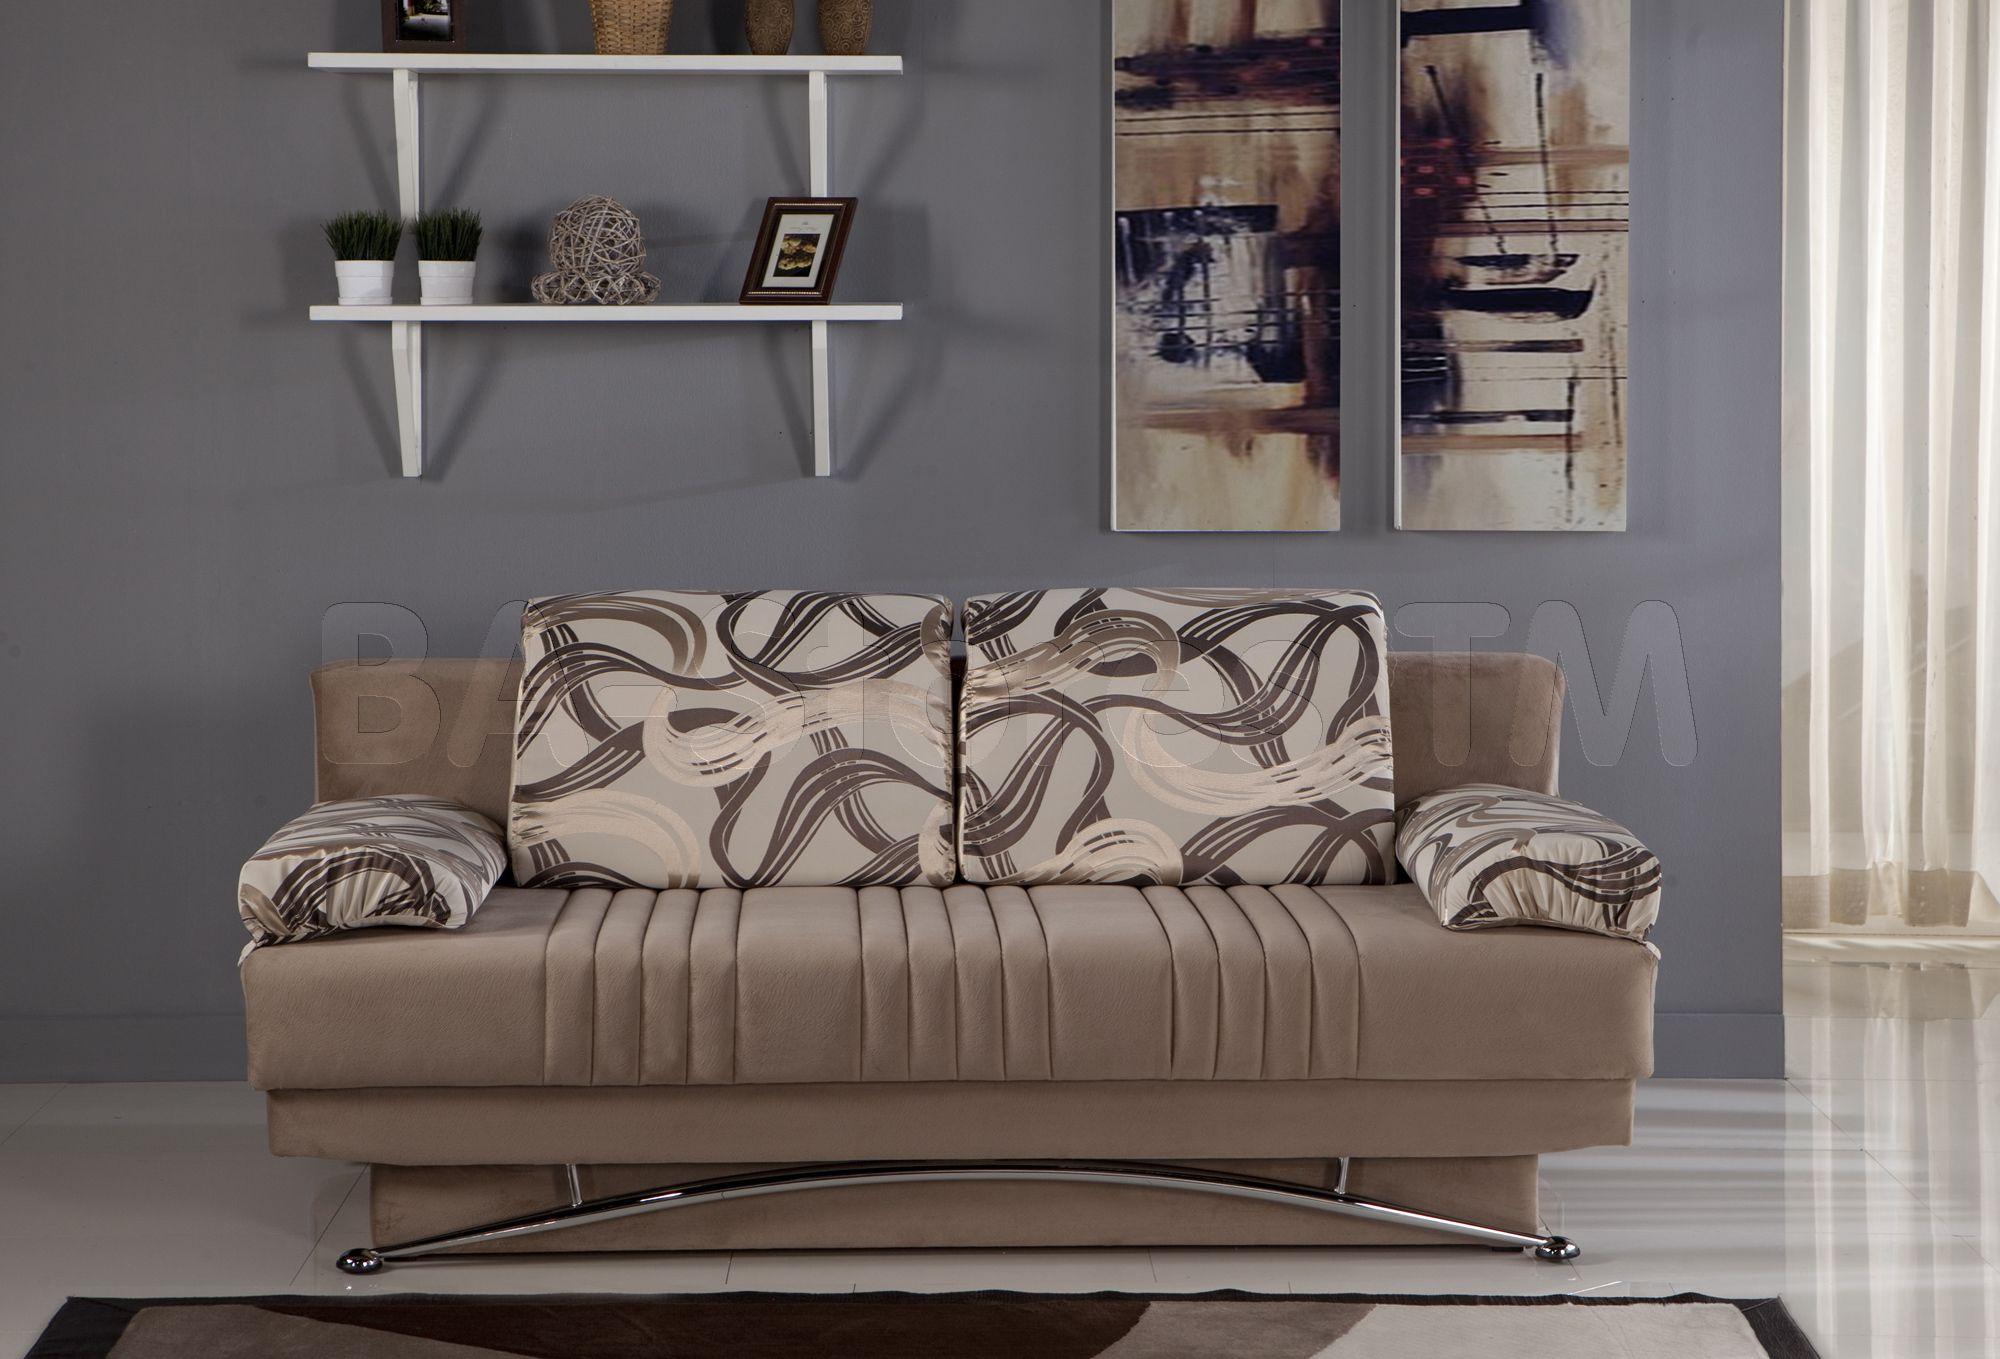 Remarkable Fantasy Sofa Sleeper In Best Vizon By Istikbal Convertible Spiritservingveterans Wood Chair Design Ideas Spiritservingveteransorg